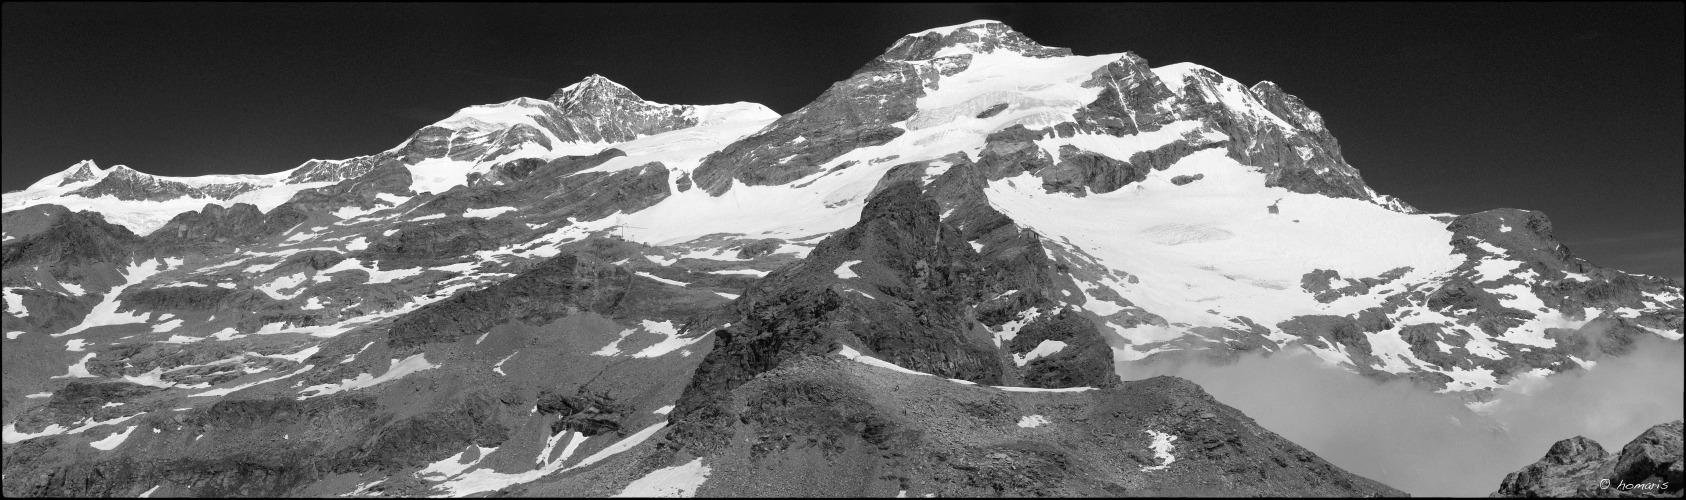 5 d'agost de 2009. El Monte Rosa des del Paso dei Salati.